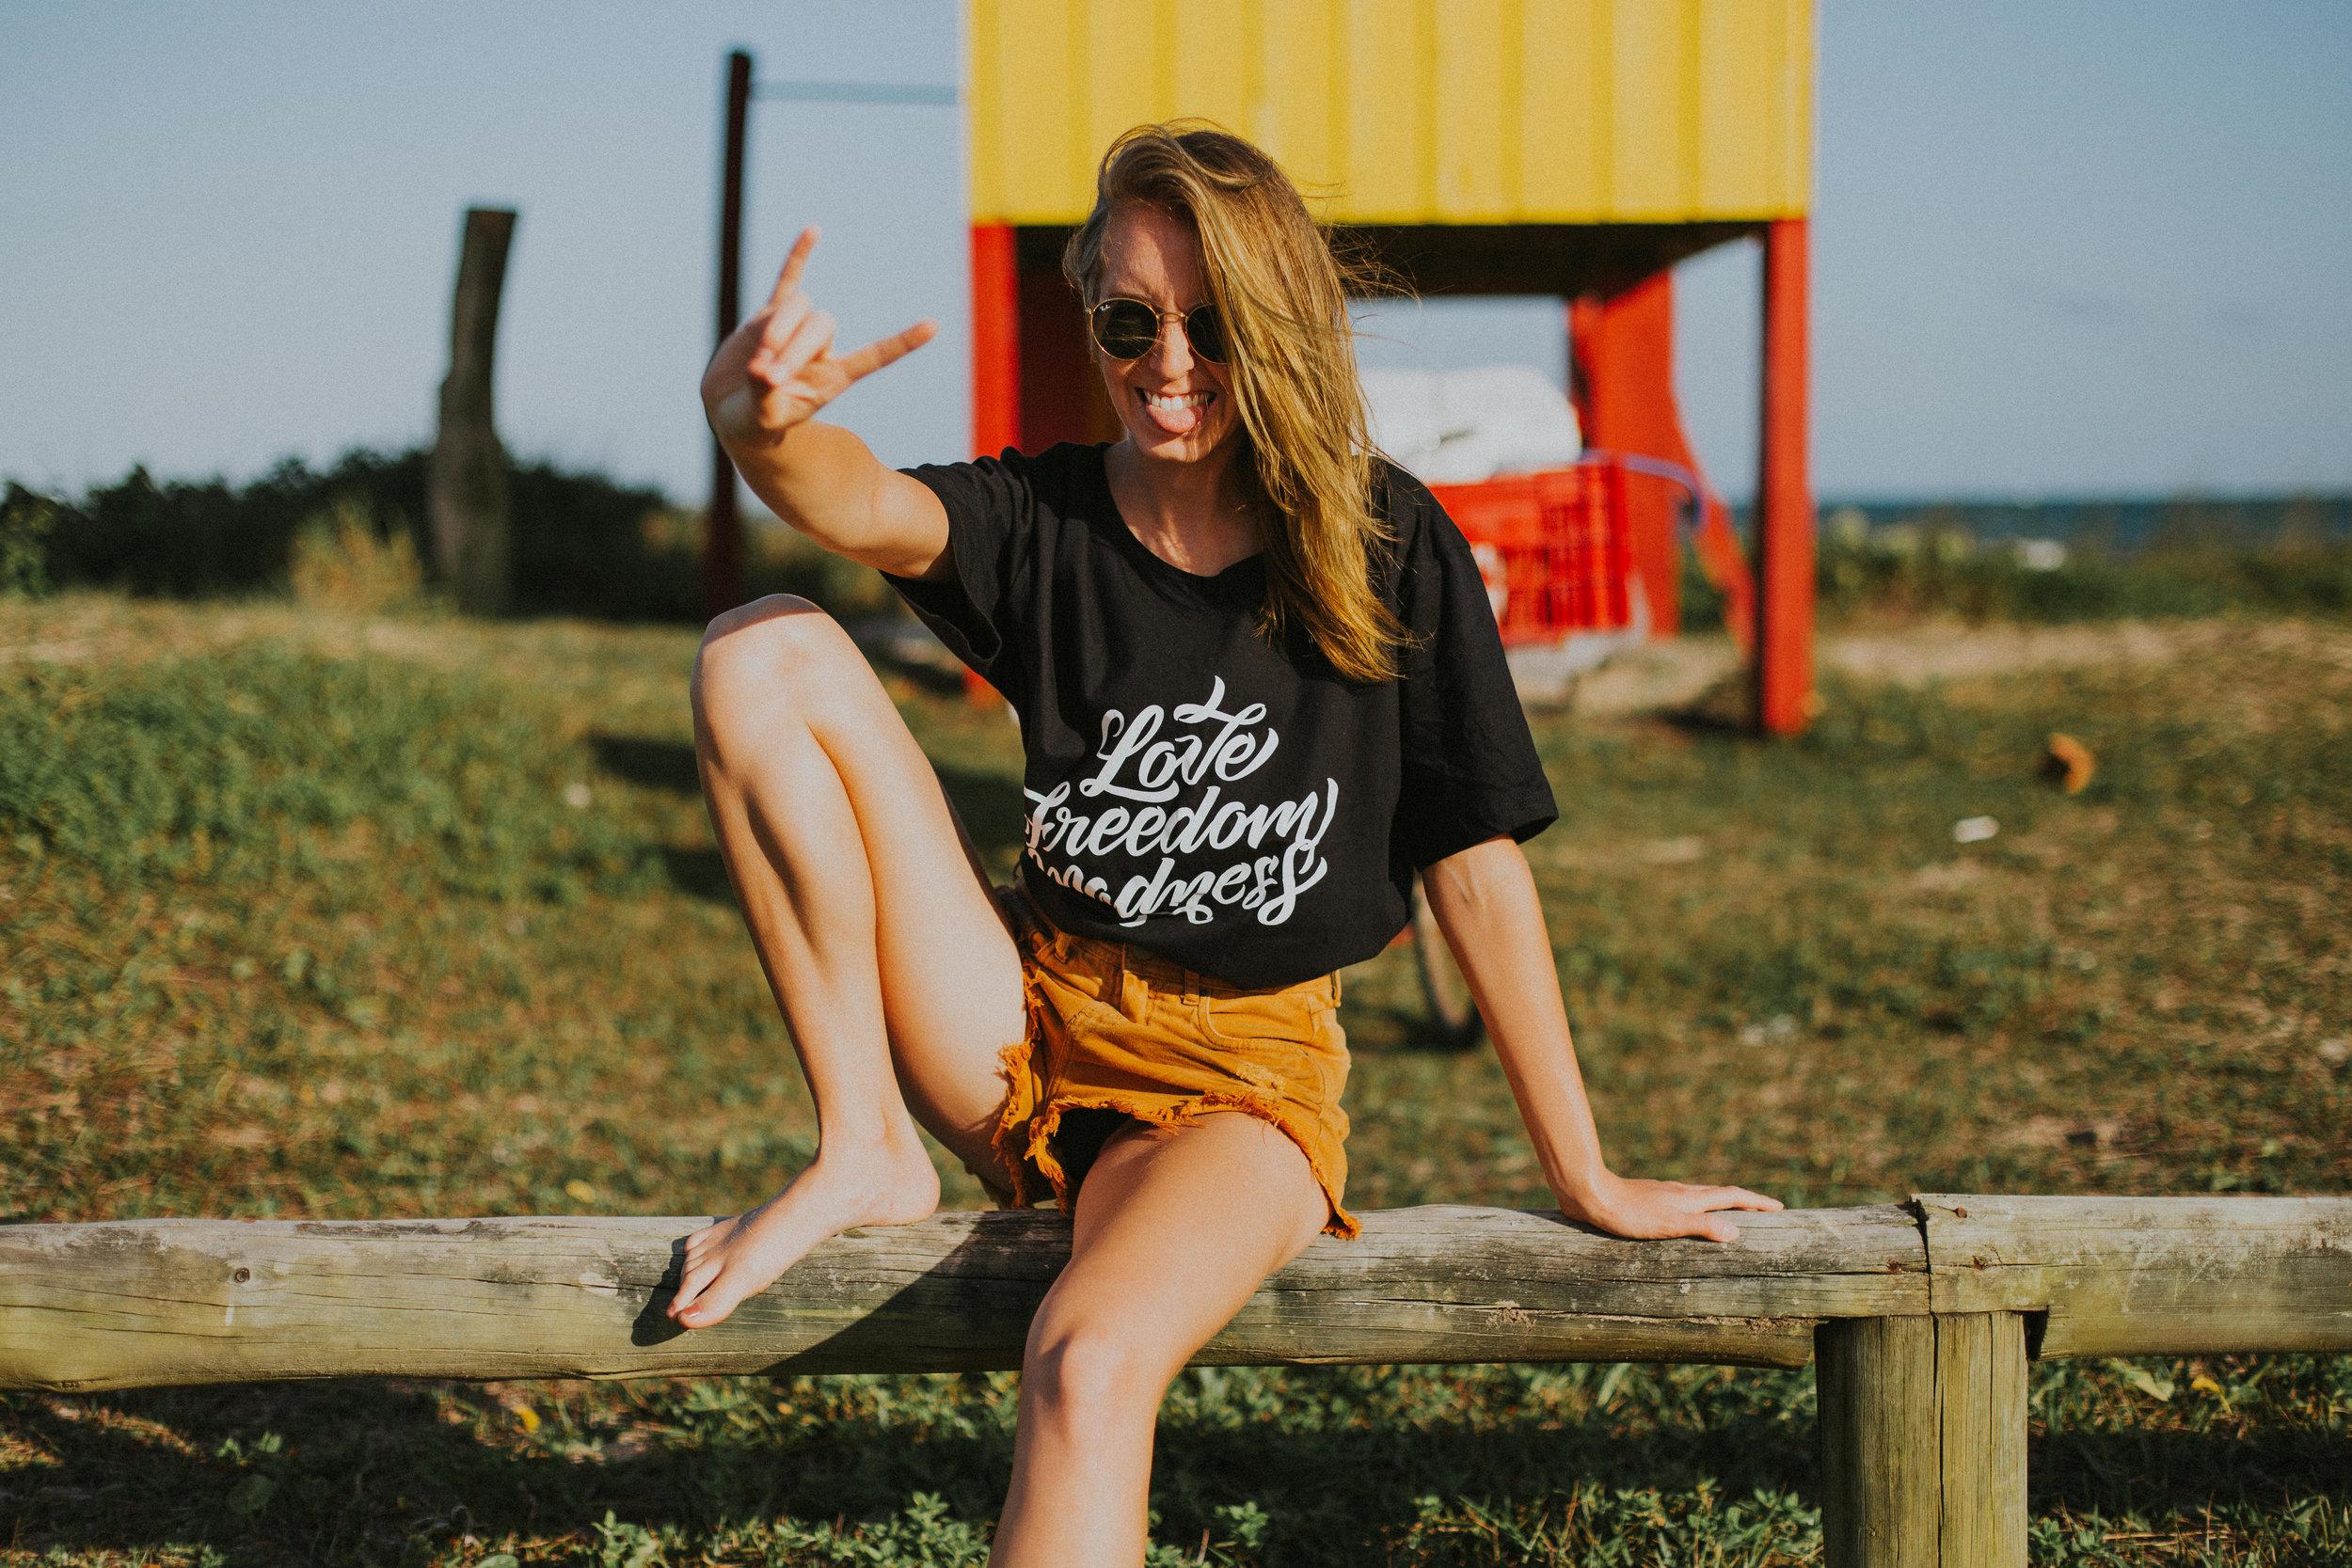 Gaby-Braun-Love-Freedom-Madness-Model-Brazil-t-shirt-beach-praia-ensaio-campanha-fotos-na-praia-ricardo-franzen-1.jpg